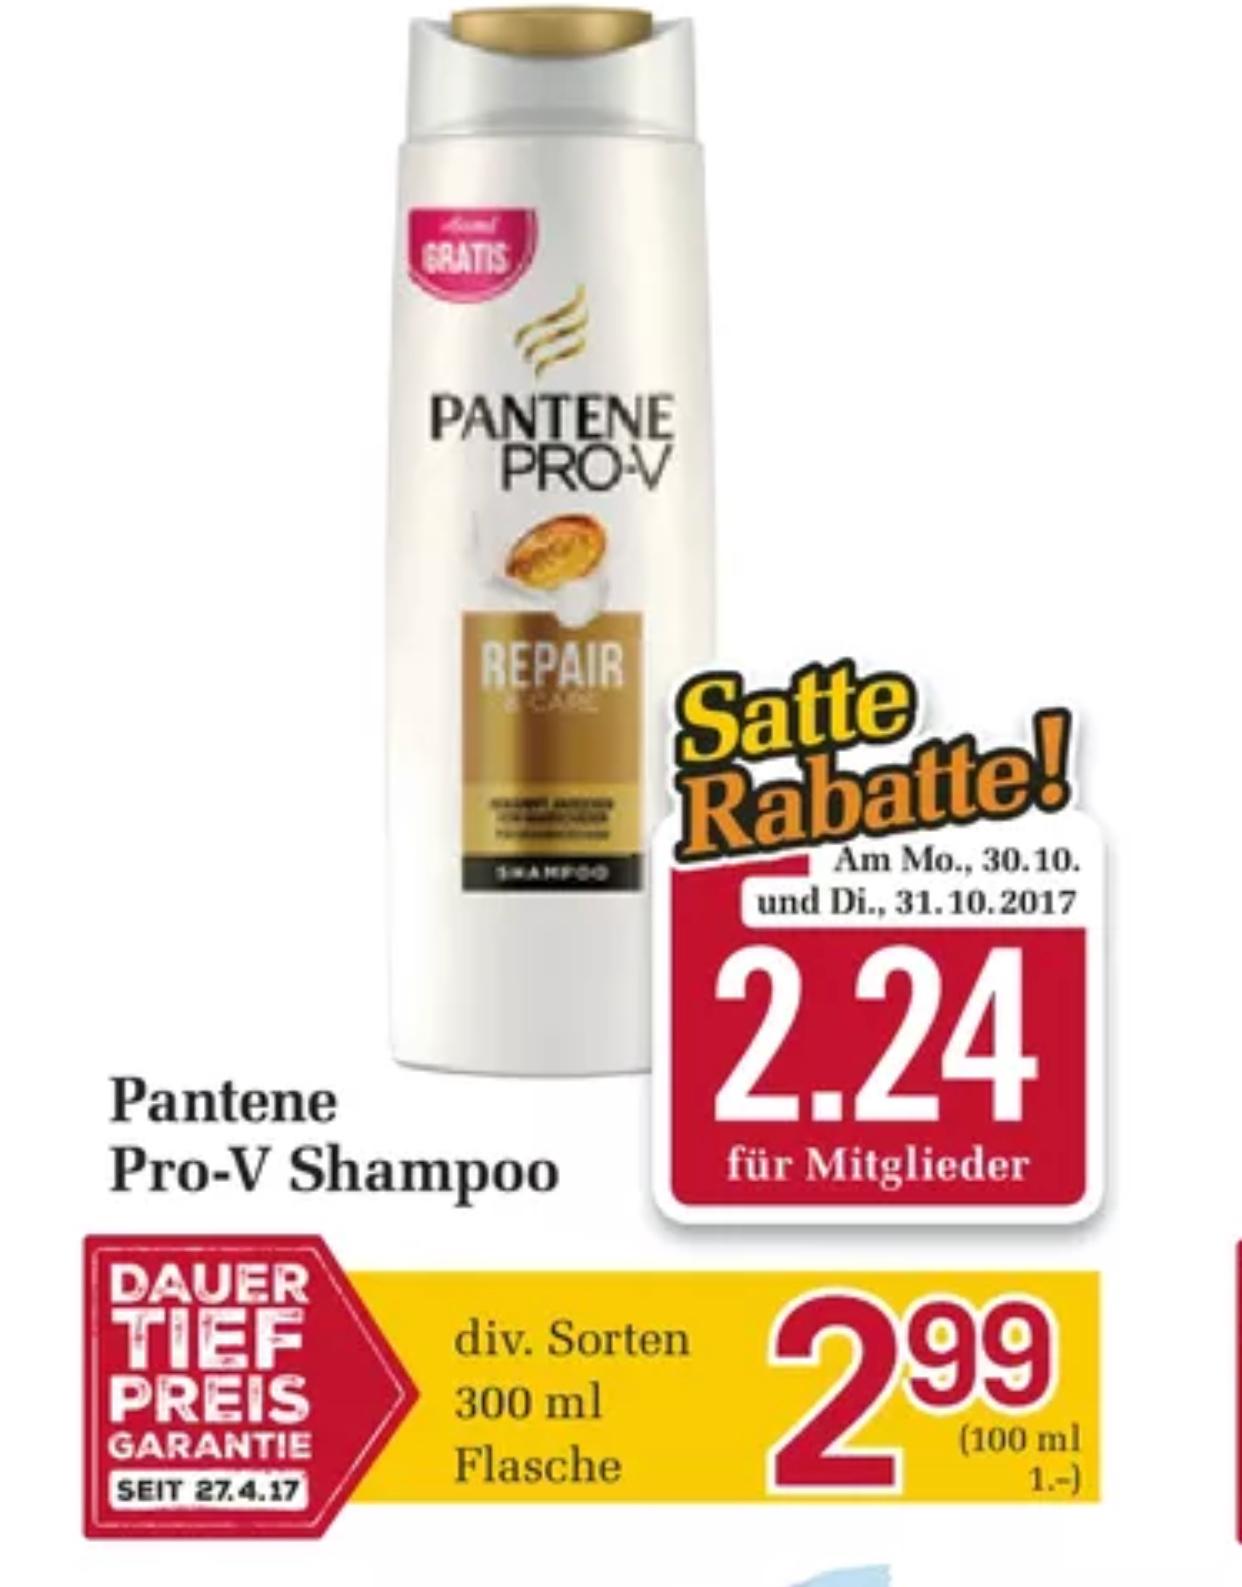 Pantene Pro V für 1,24€